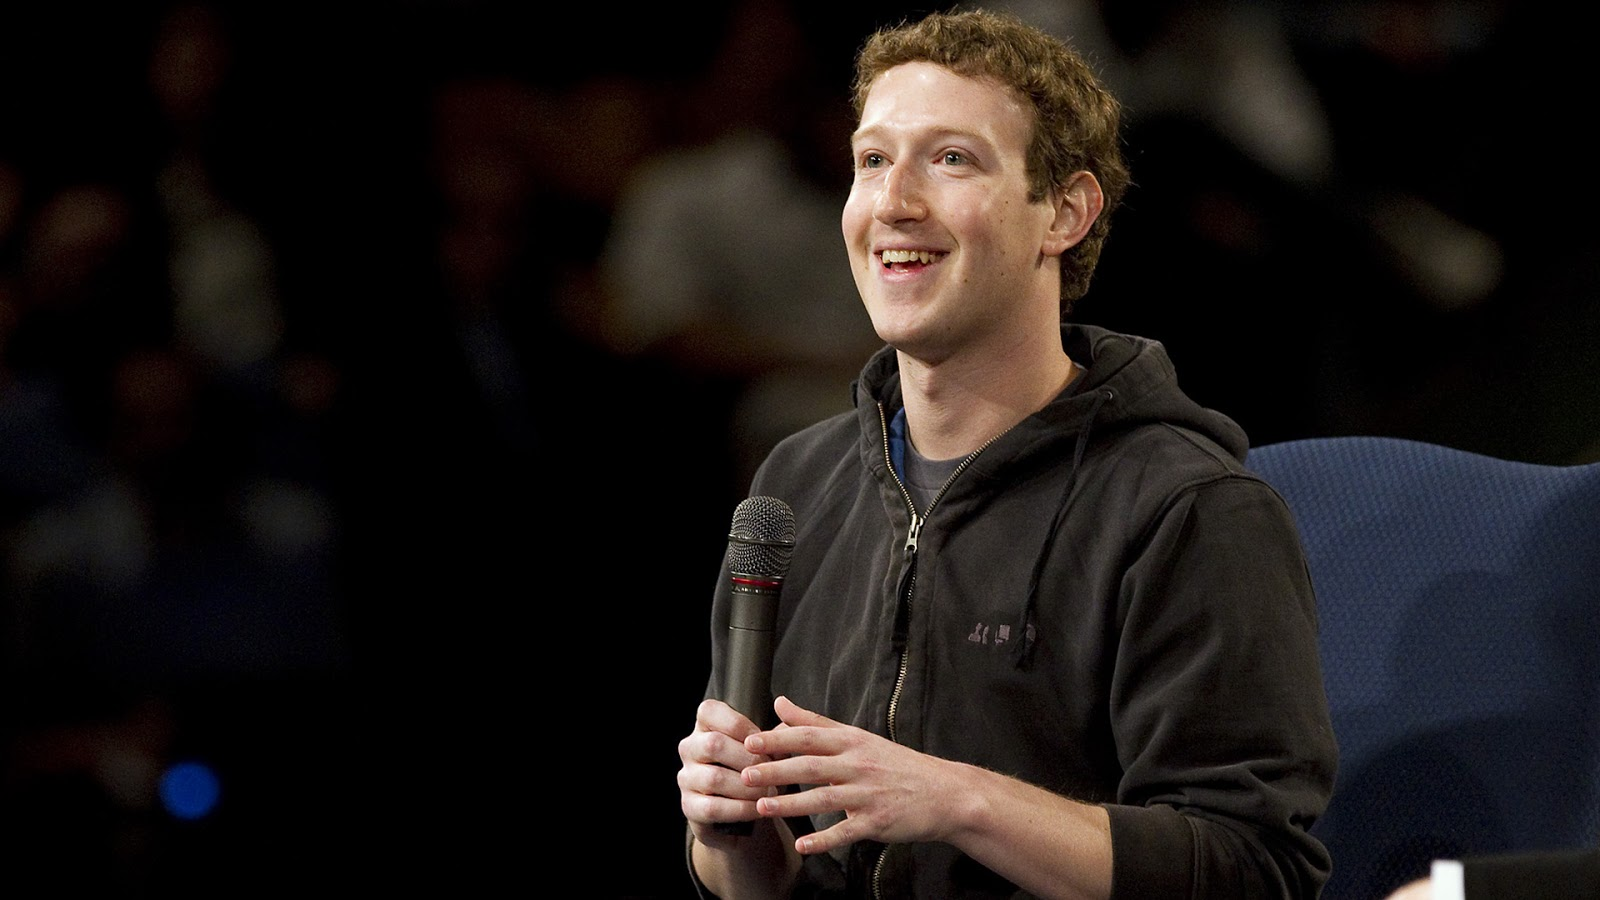 Mark Zuckerberg Wallpaper Photos 2014 7034739 1600x900